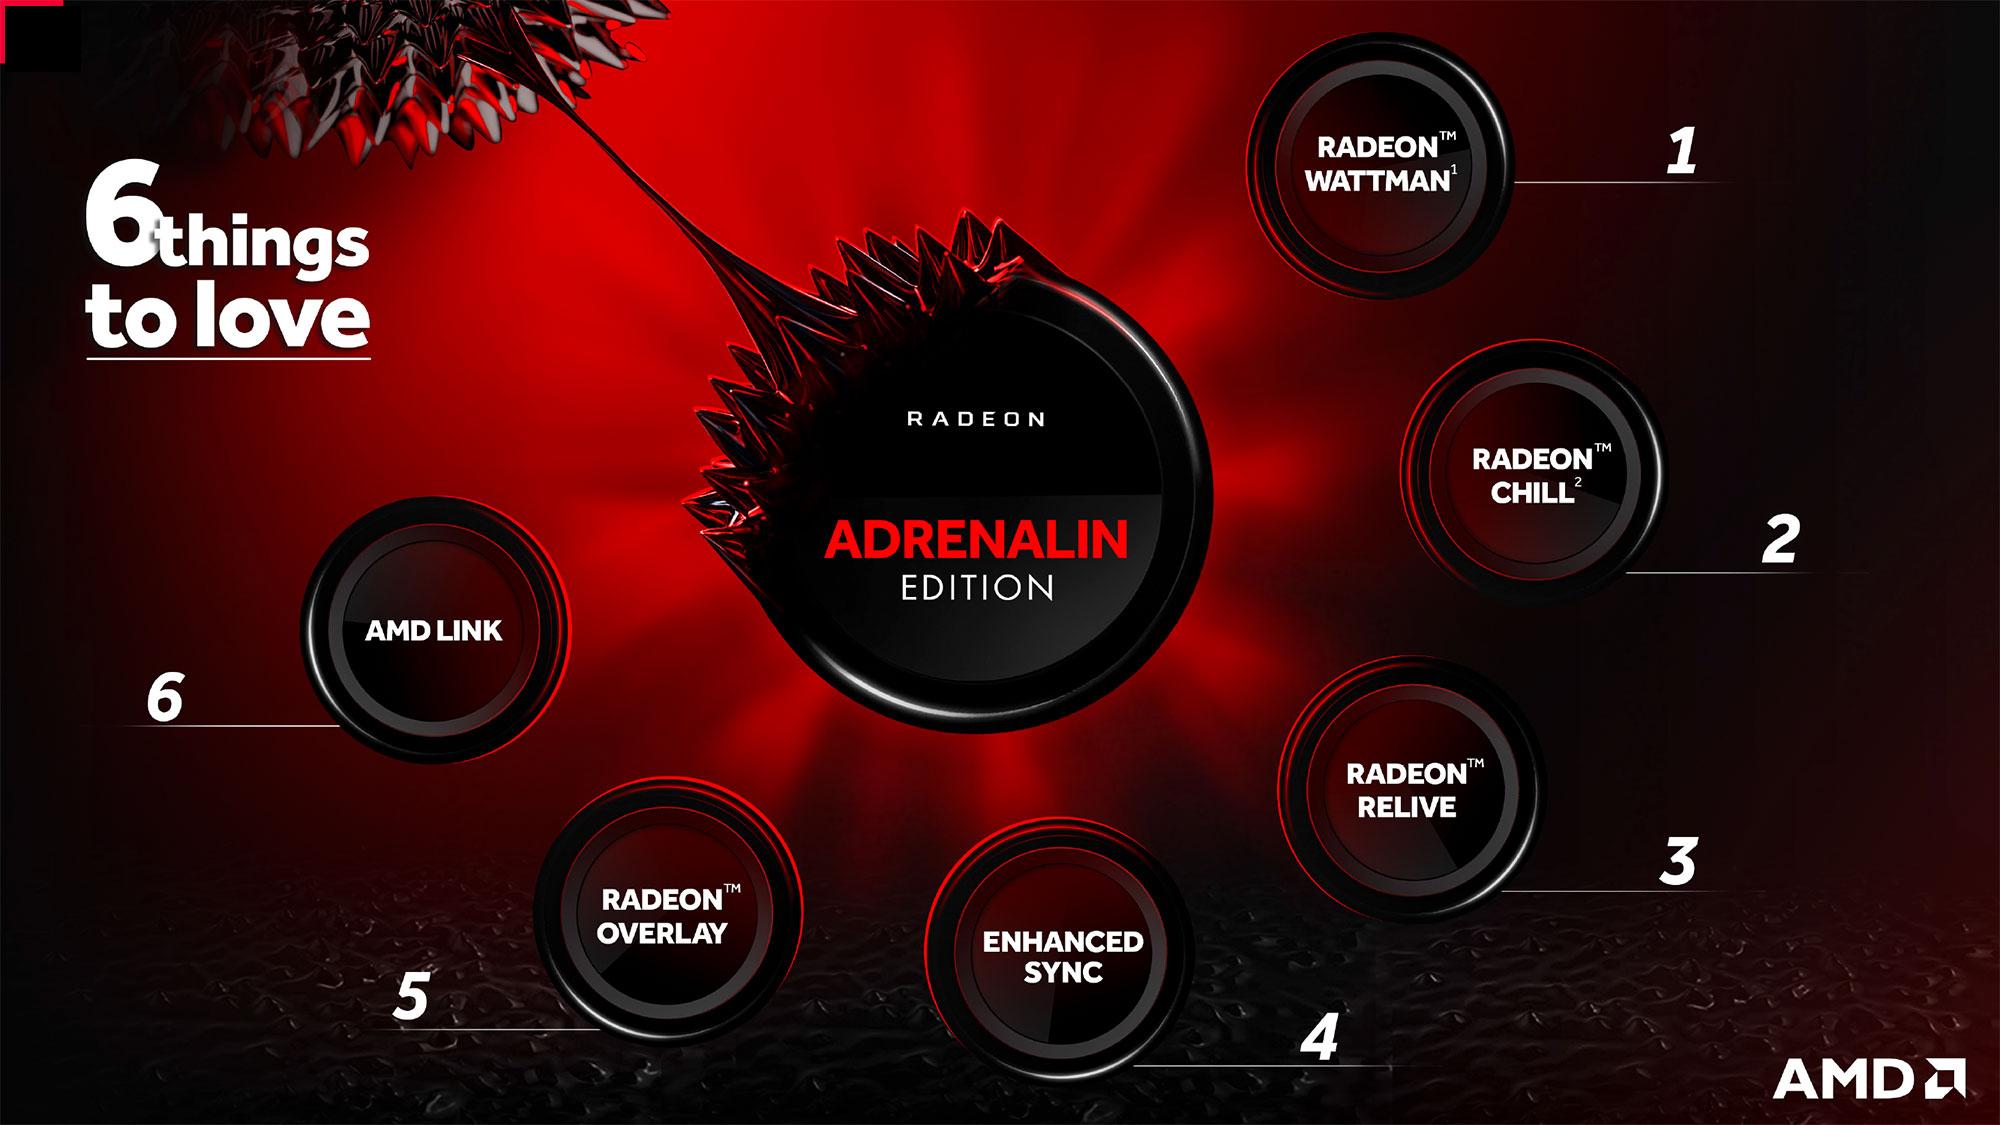 AMD Radeon Adrenalin Edition windows